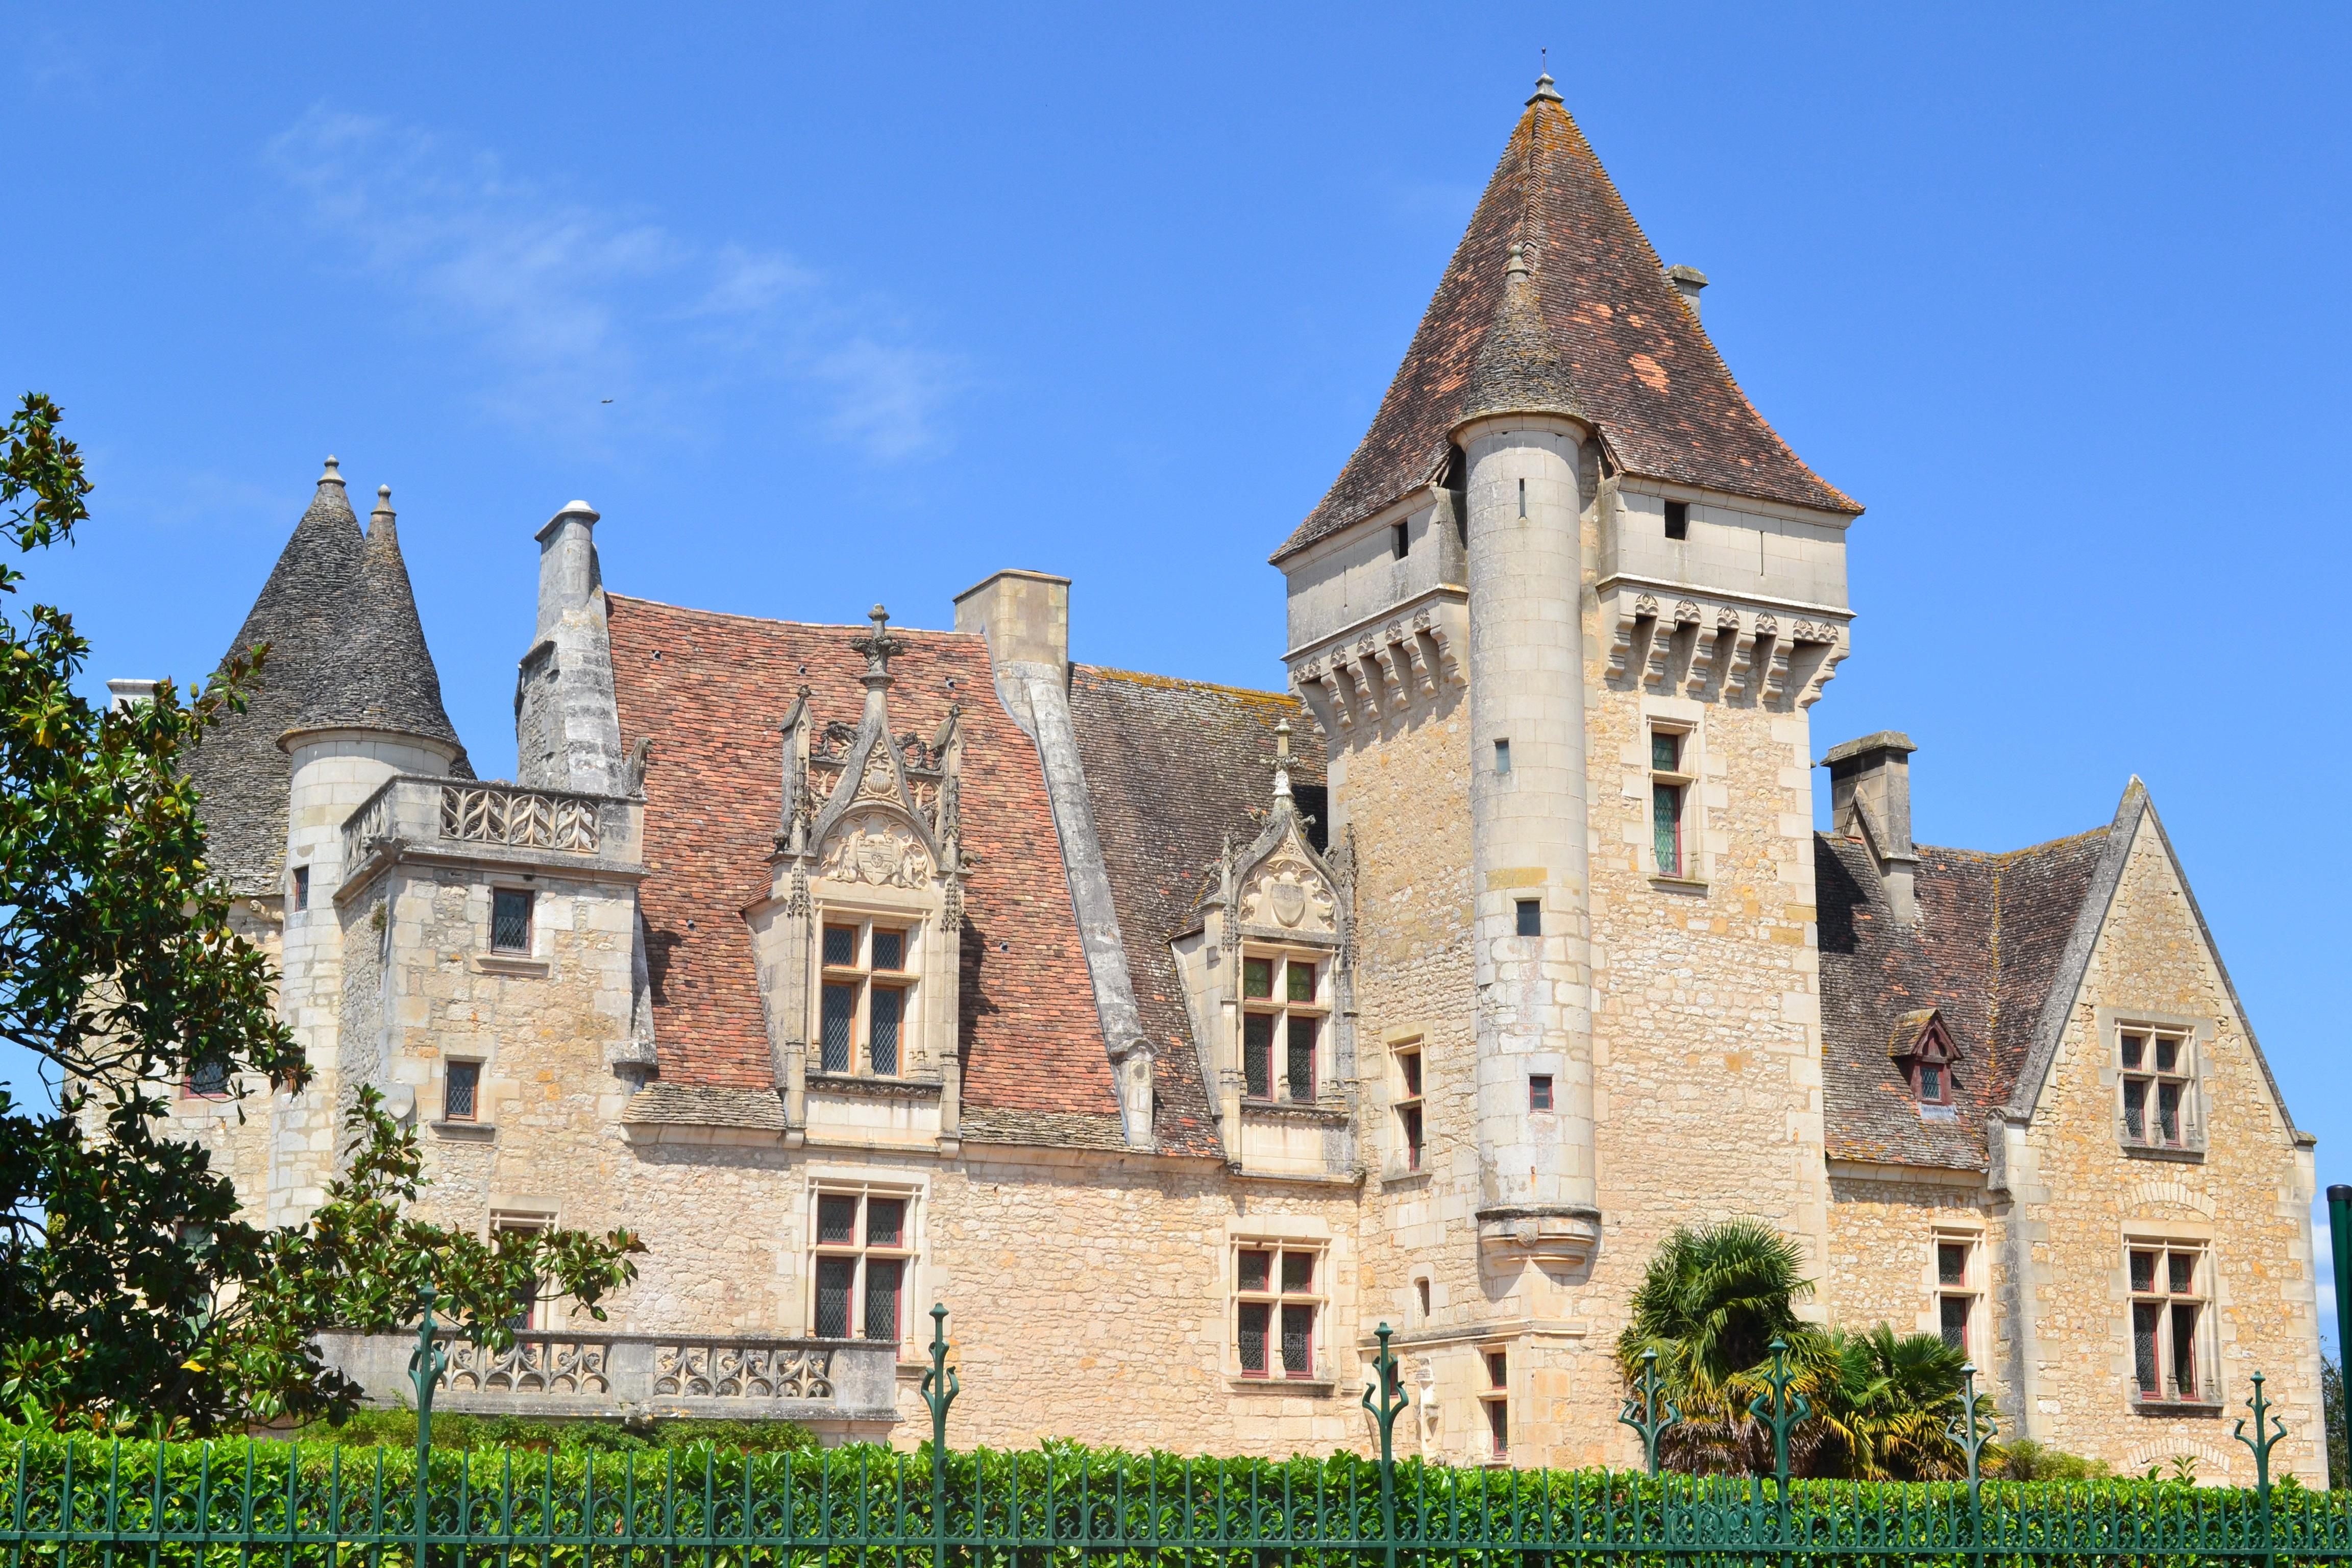 immagini belle costruzione chateau francia torre